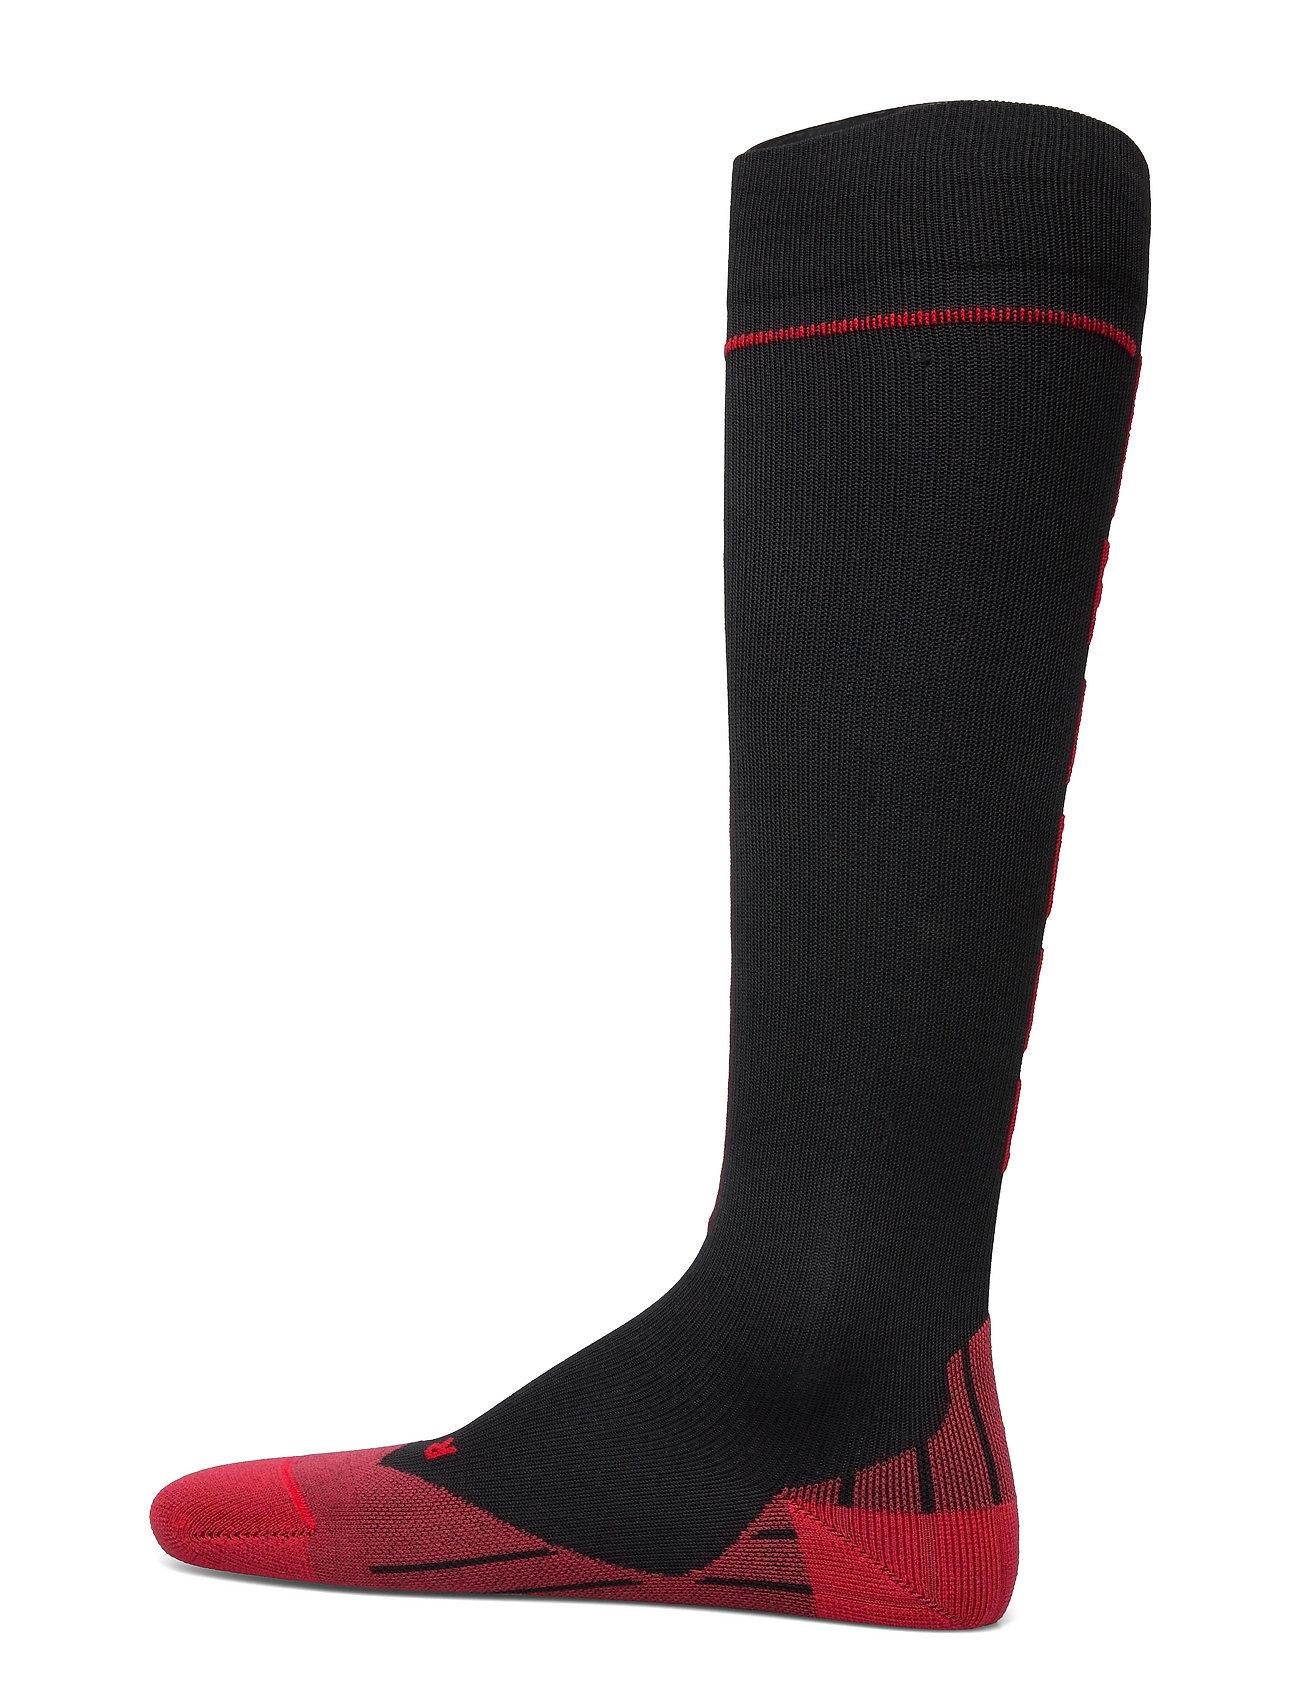 Falke Energizing Women Underwear Socks Regular Socks Sort Falke Sport